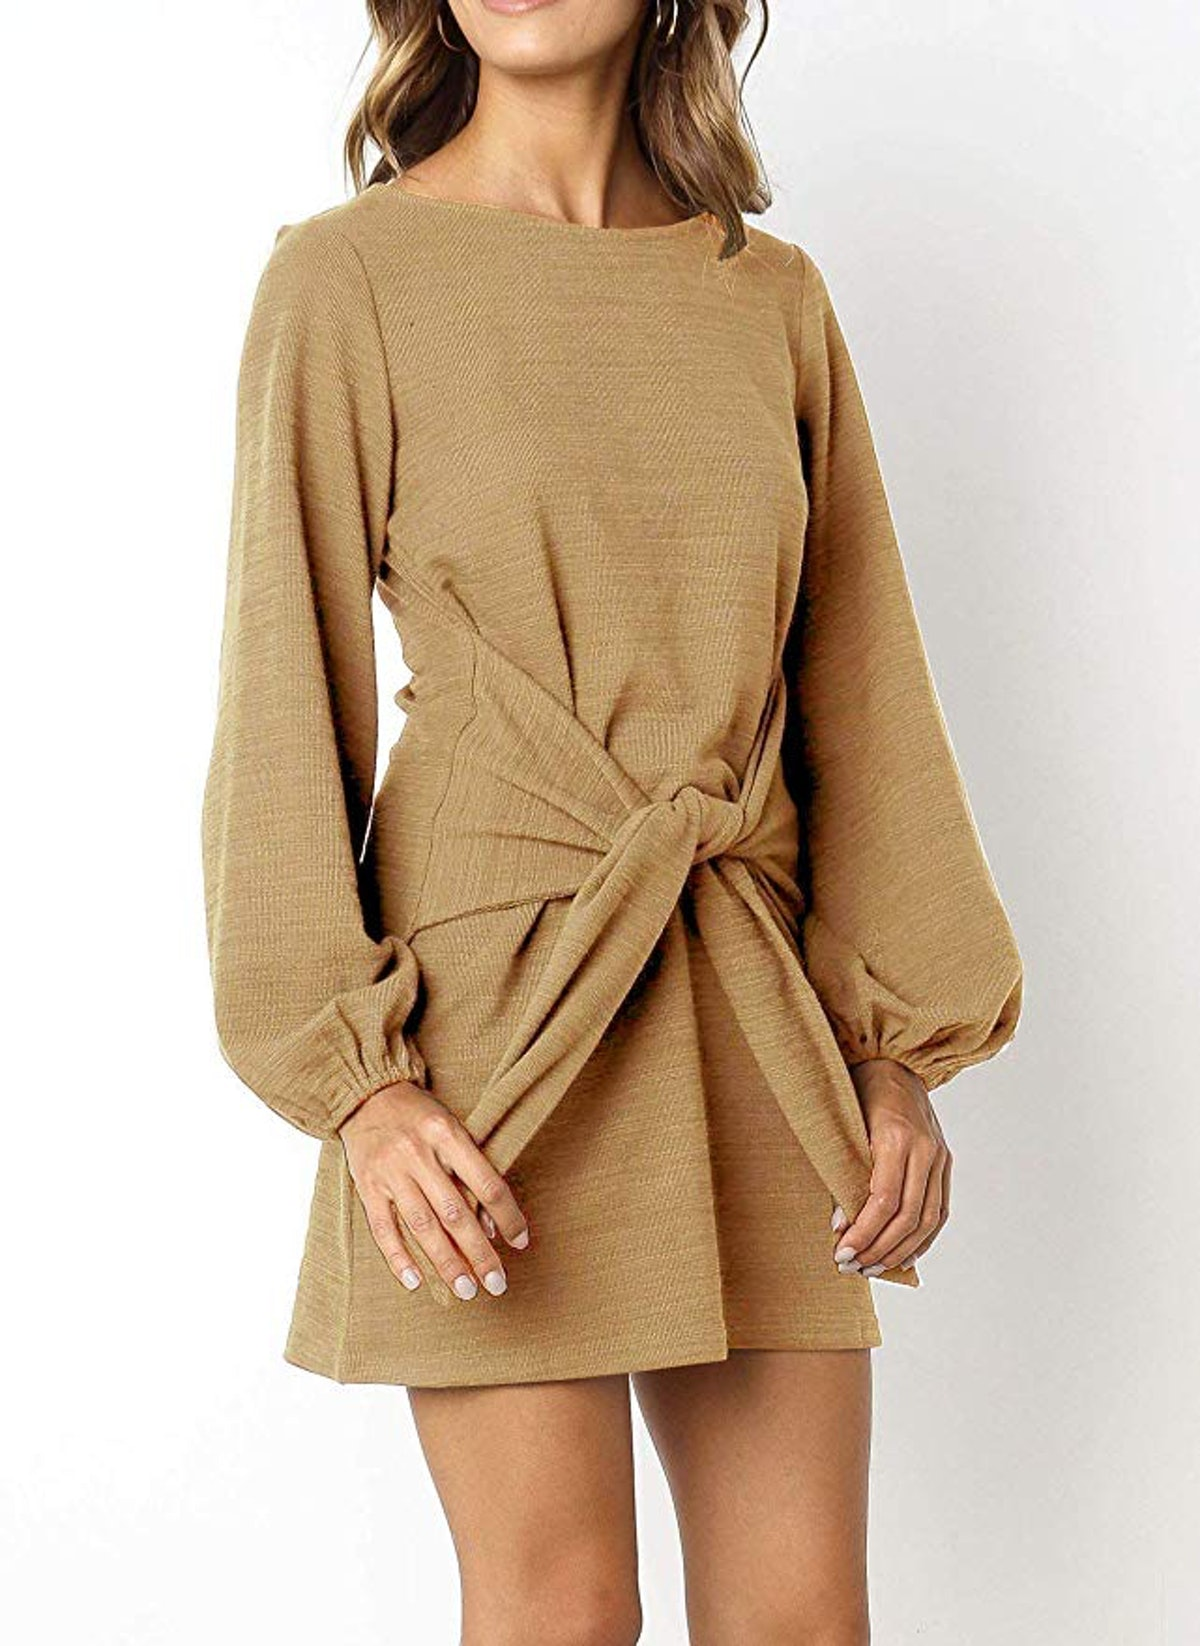 R.Vivimos Women's Autumn Sweater Pencil Dress